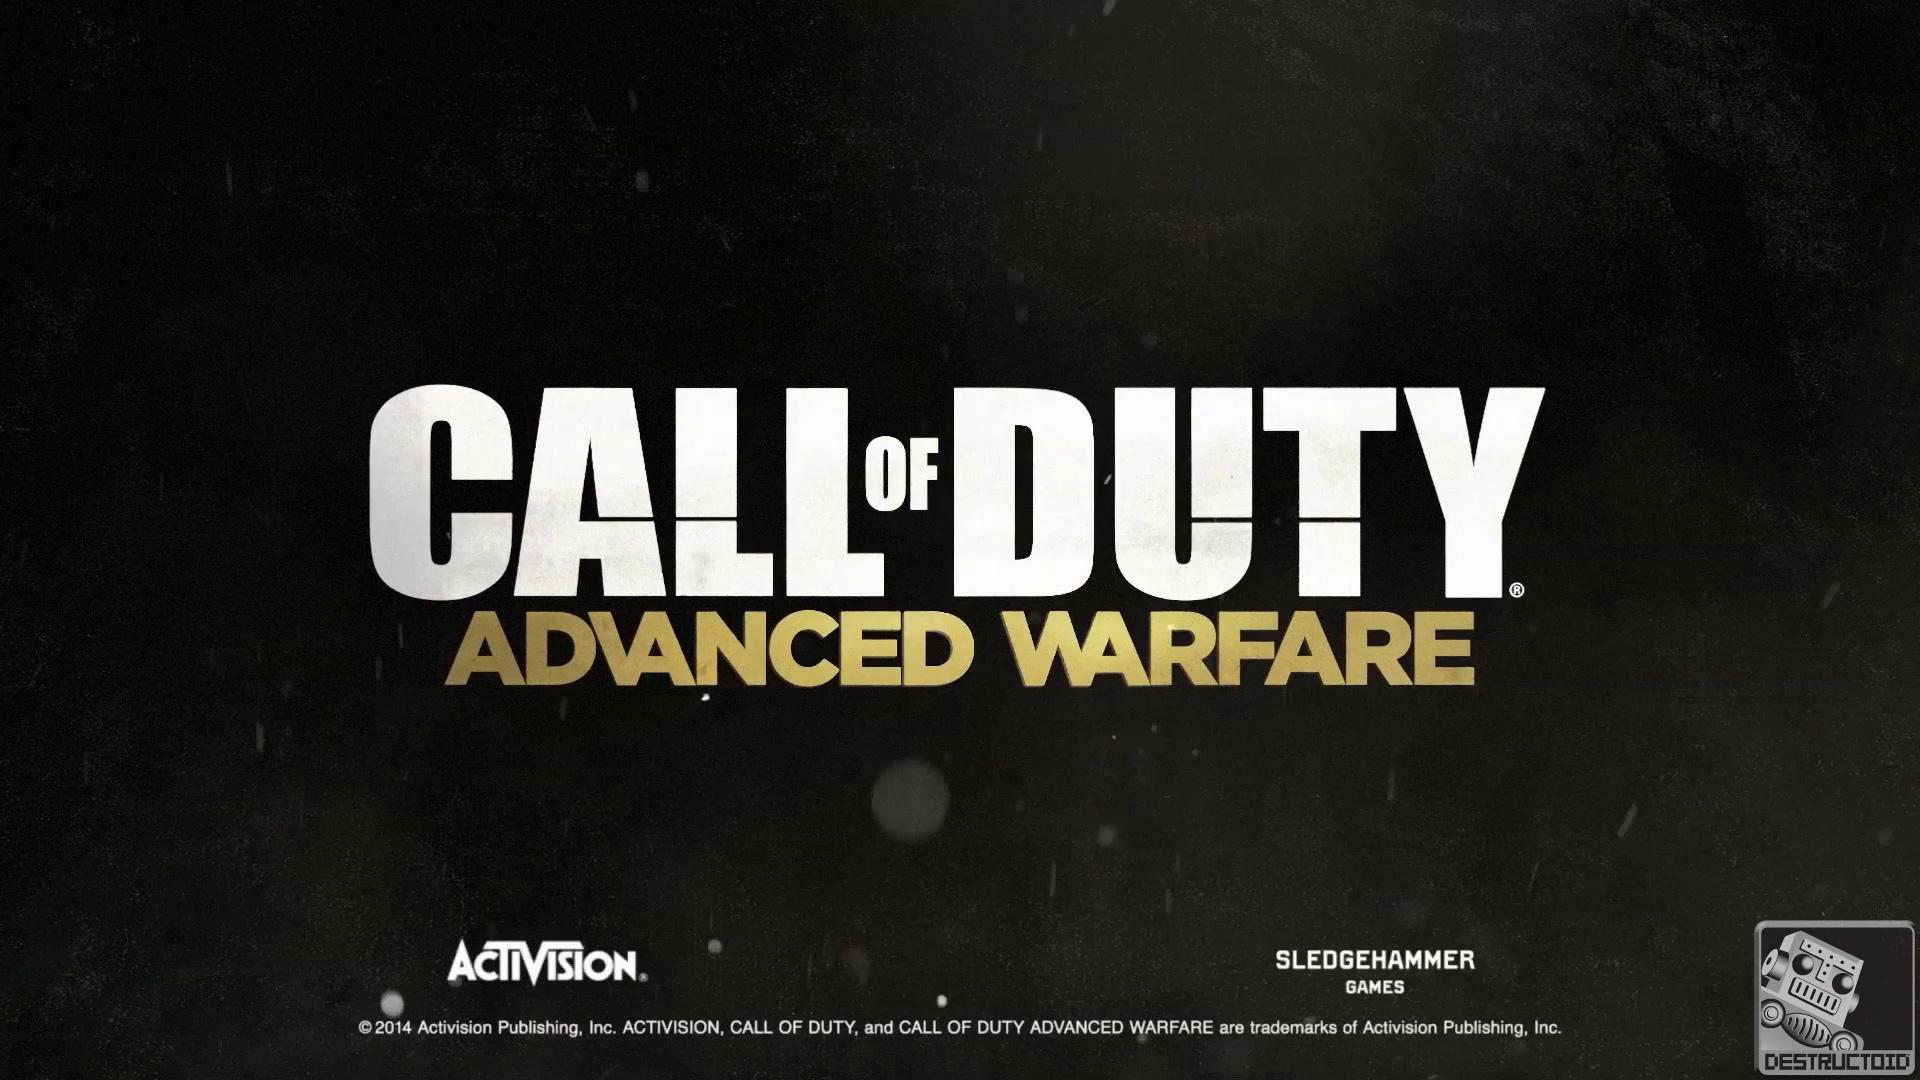 call-of-duty-advanced-warfare-screen-1